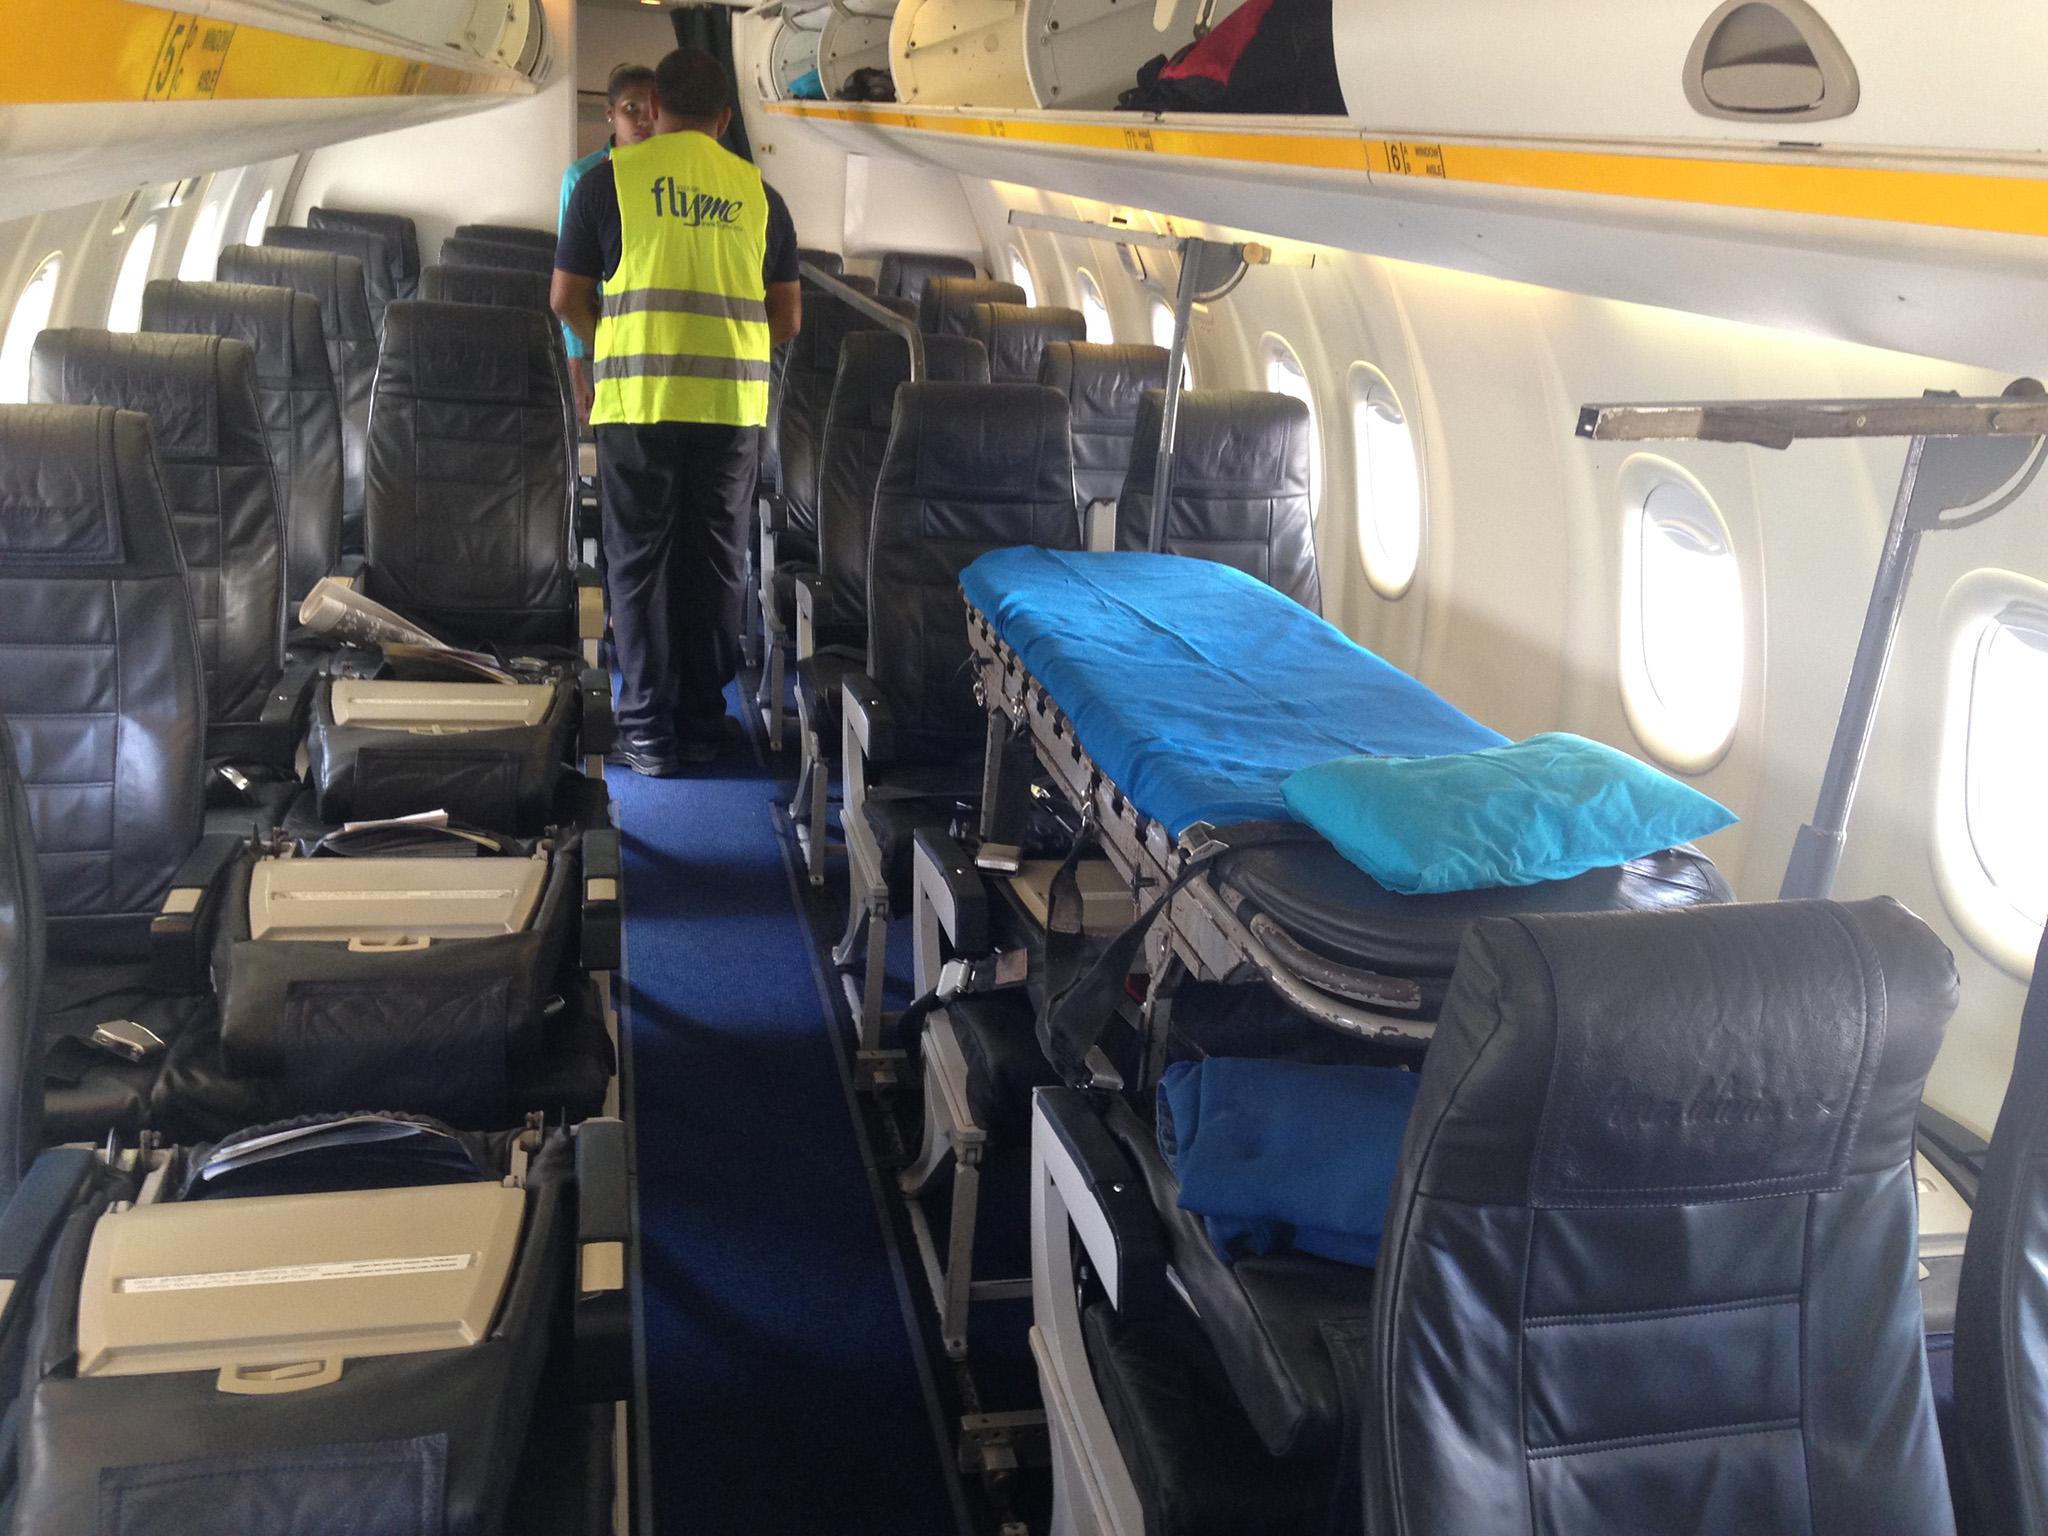 Cabina preparada para vuelo ambulancia